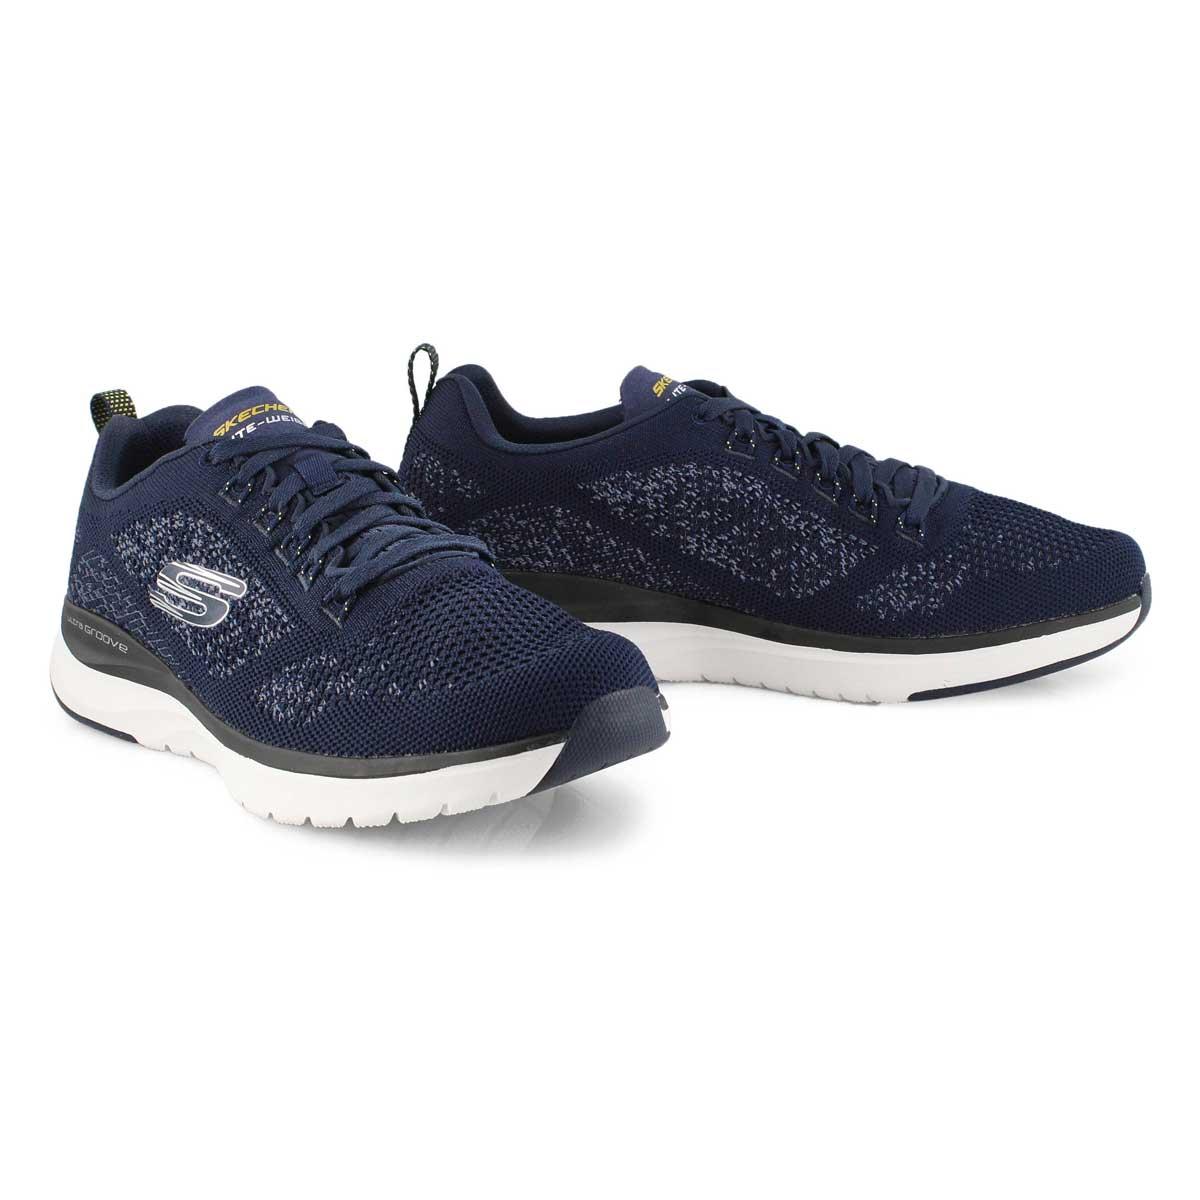 Mns Ultra Groove navy running shoe